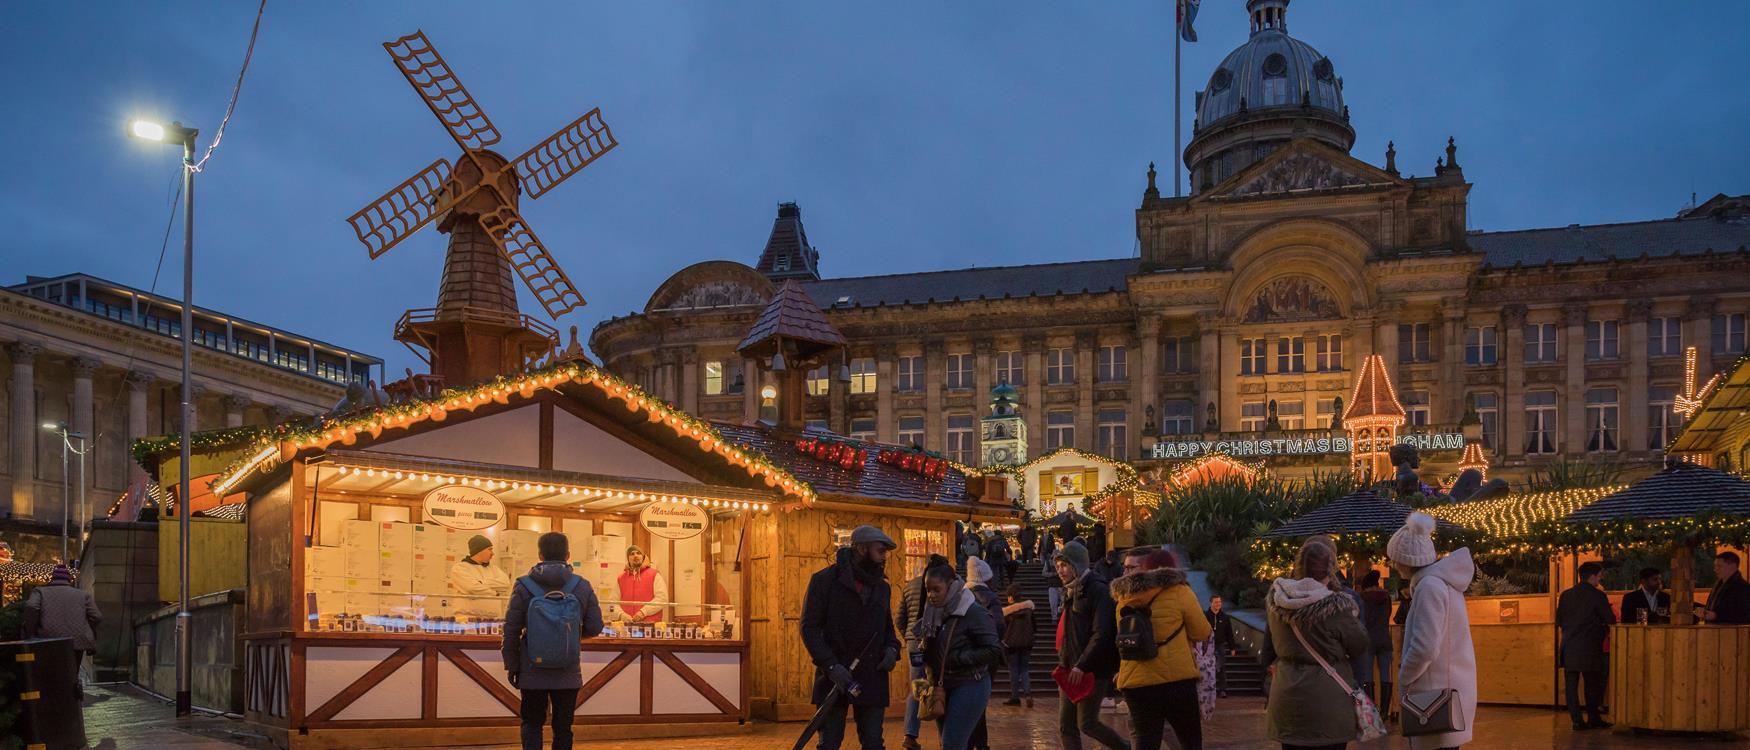 Save the date, Birmingham Frankfurt Christmas Market is back - 4 Nov - 23 Dec!